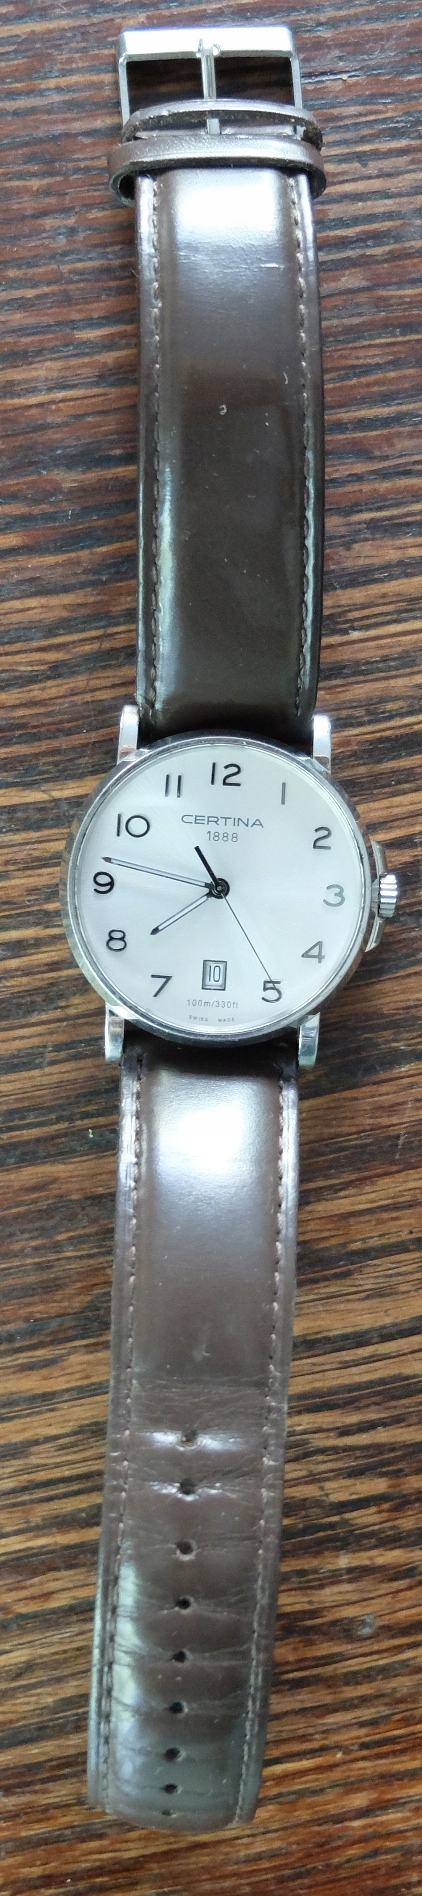 Zegarek Certina DS Caimano - TANIO na części